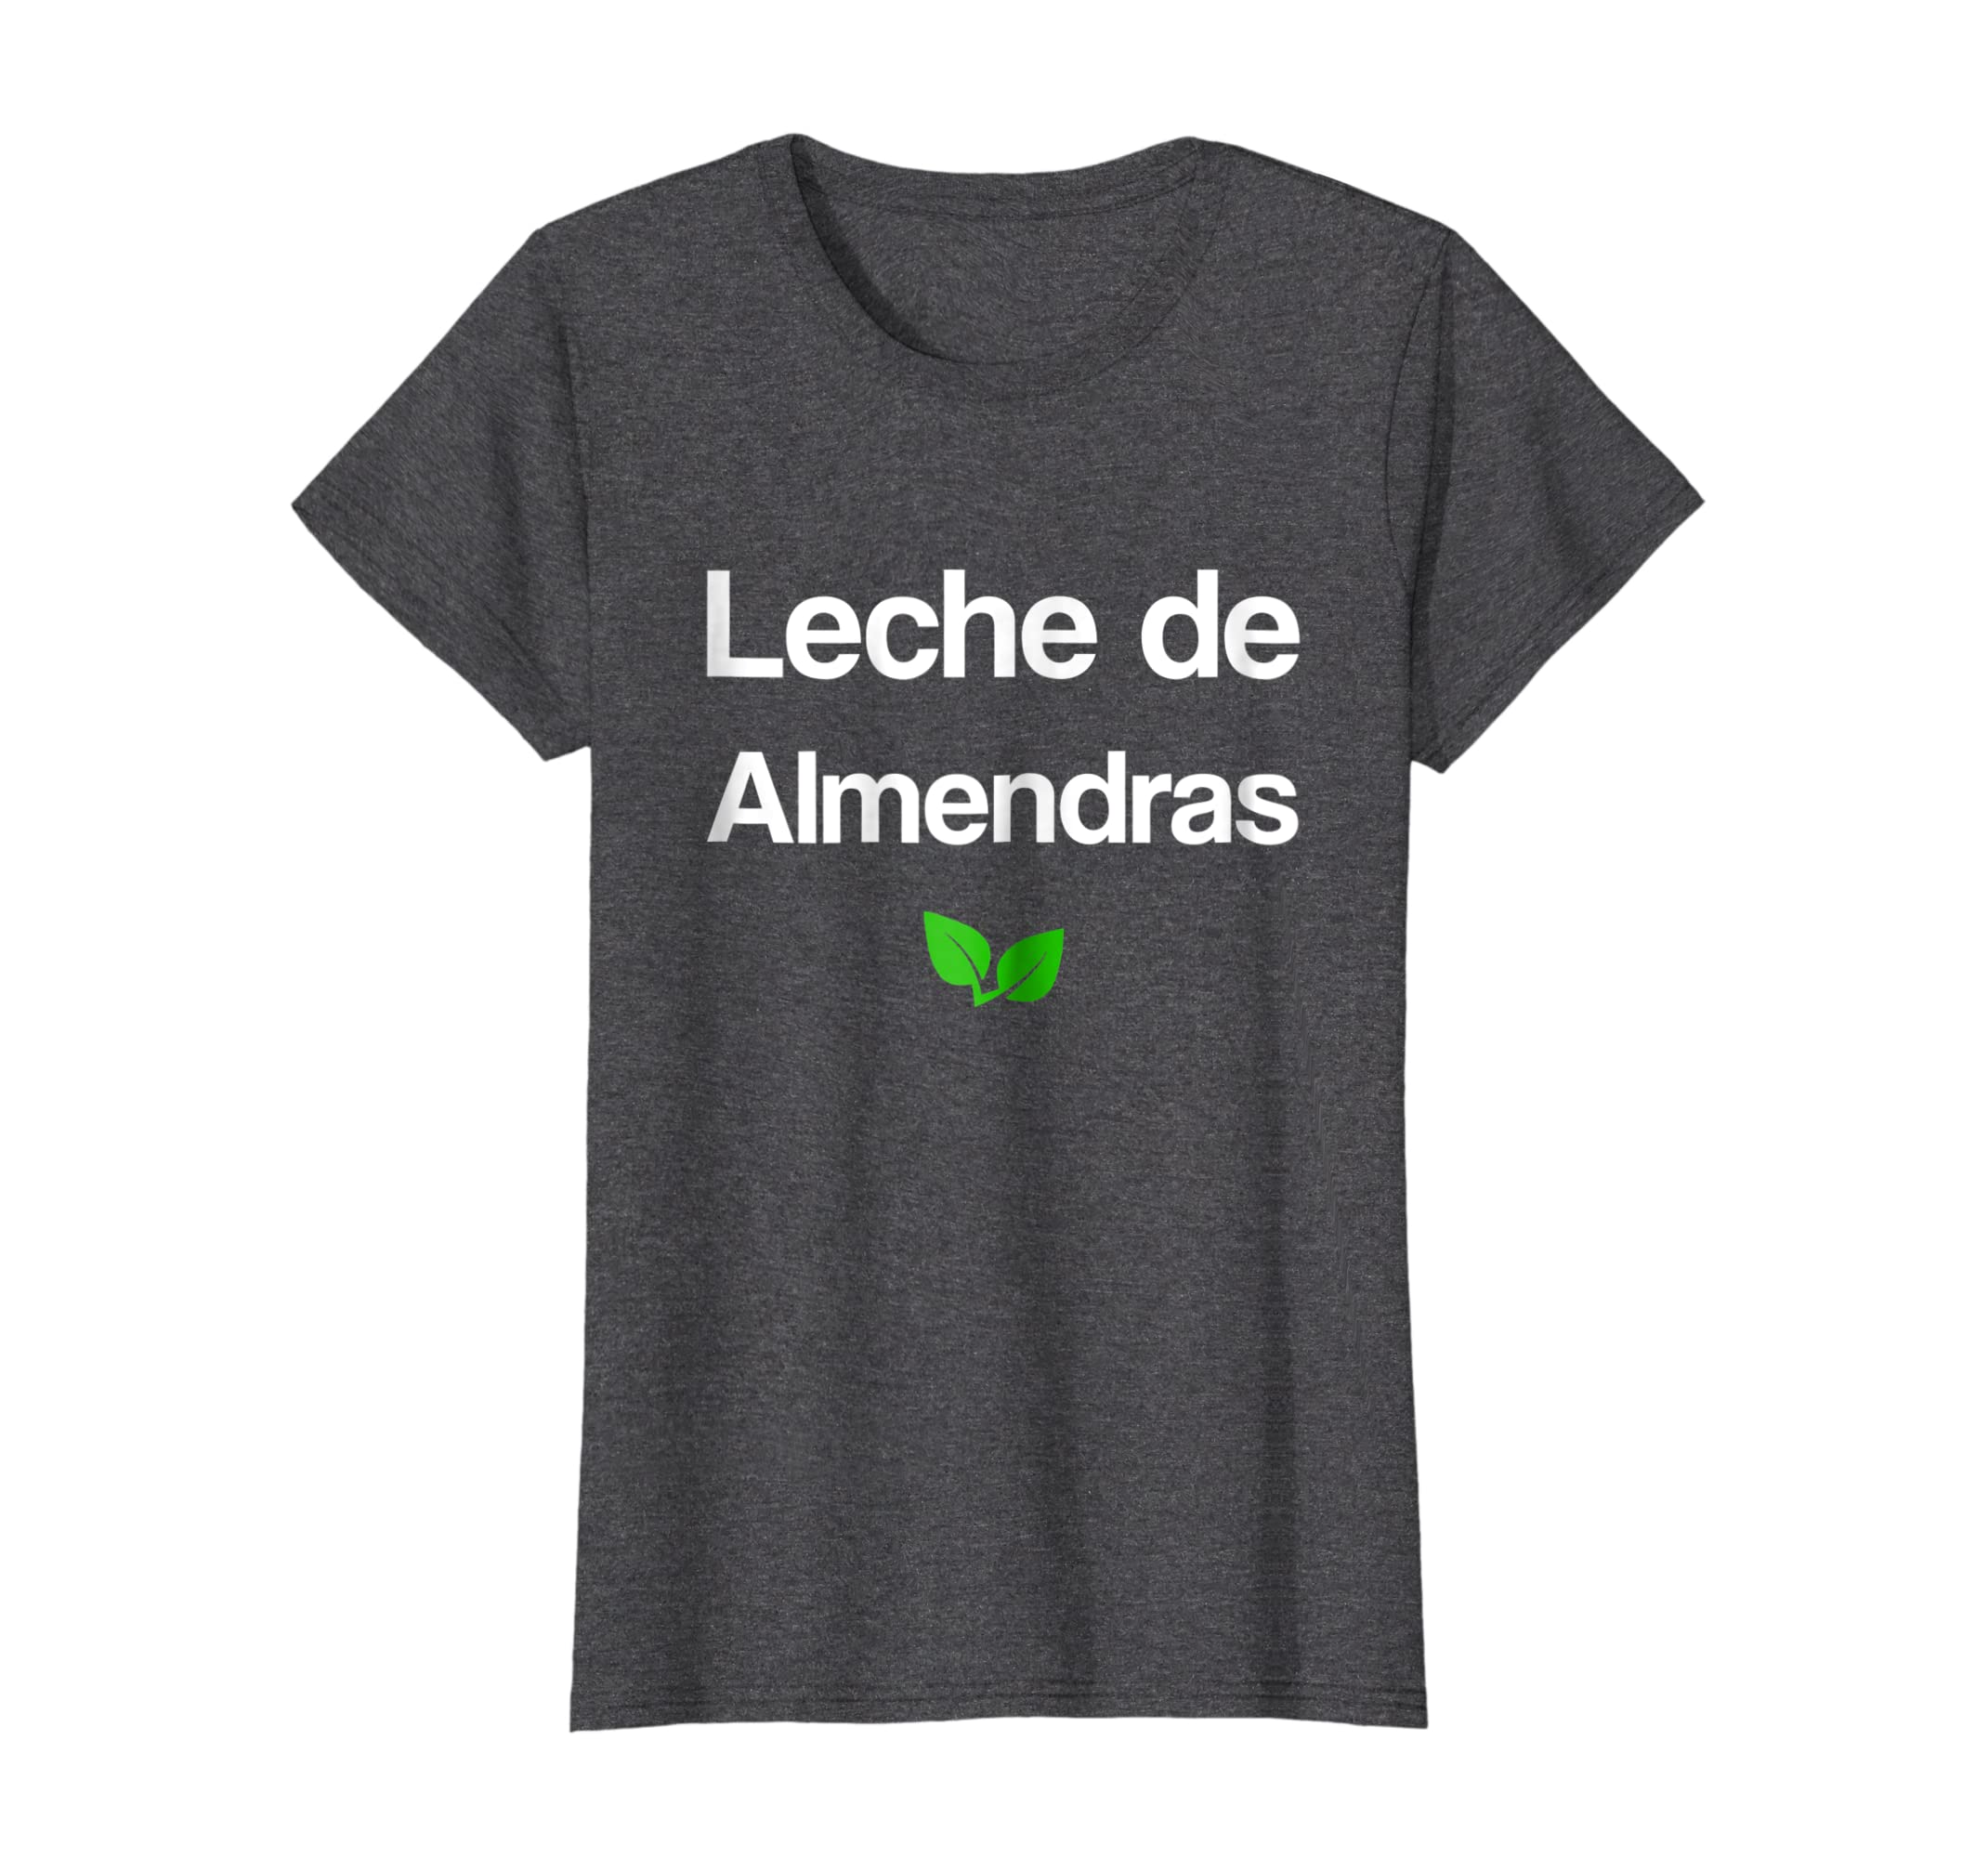 Amazon.com: Leche de Almendras Camiseta con frases Veganos Vegetarianos: Clothing